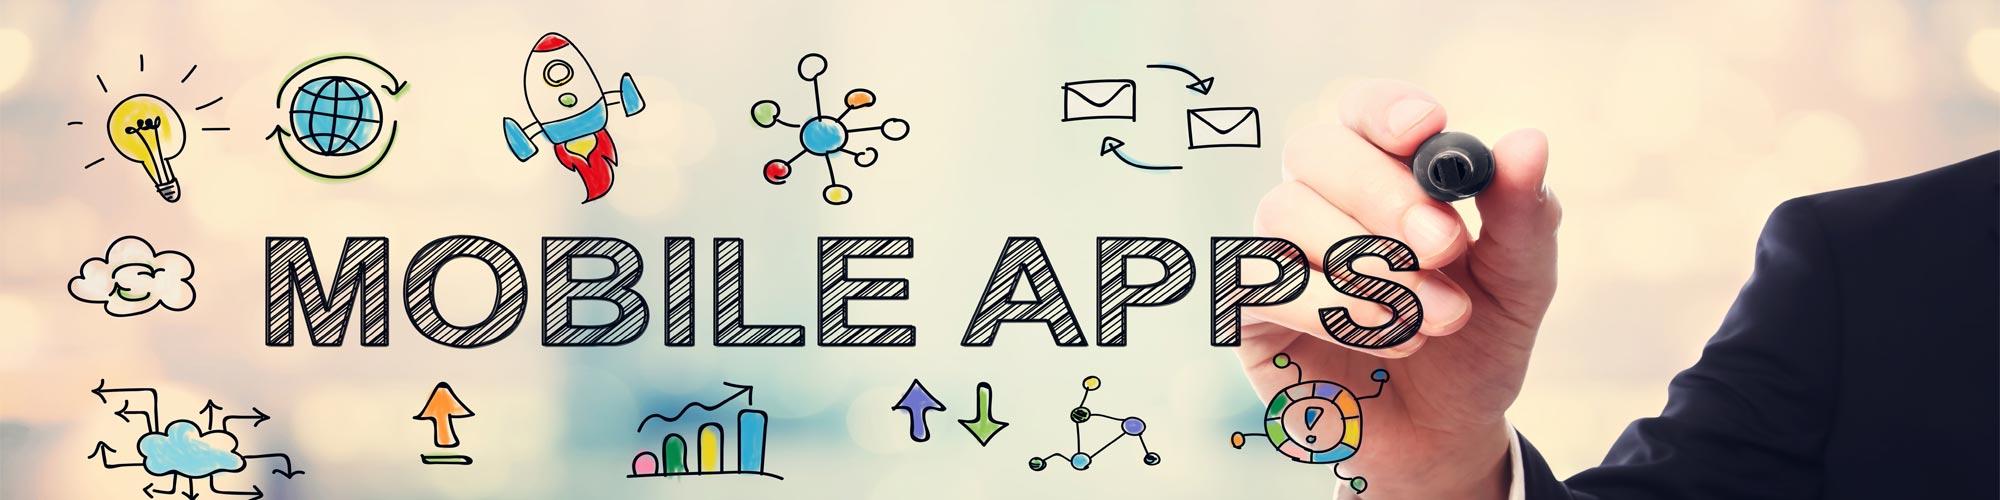 mobile-app-header